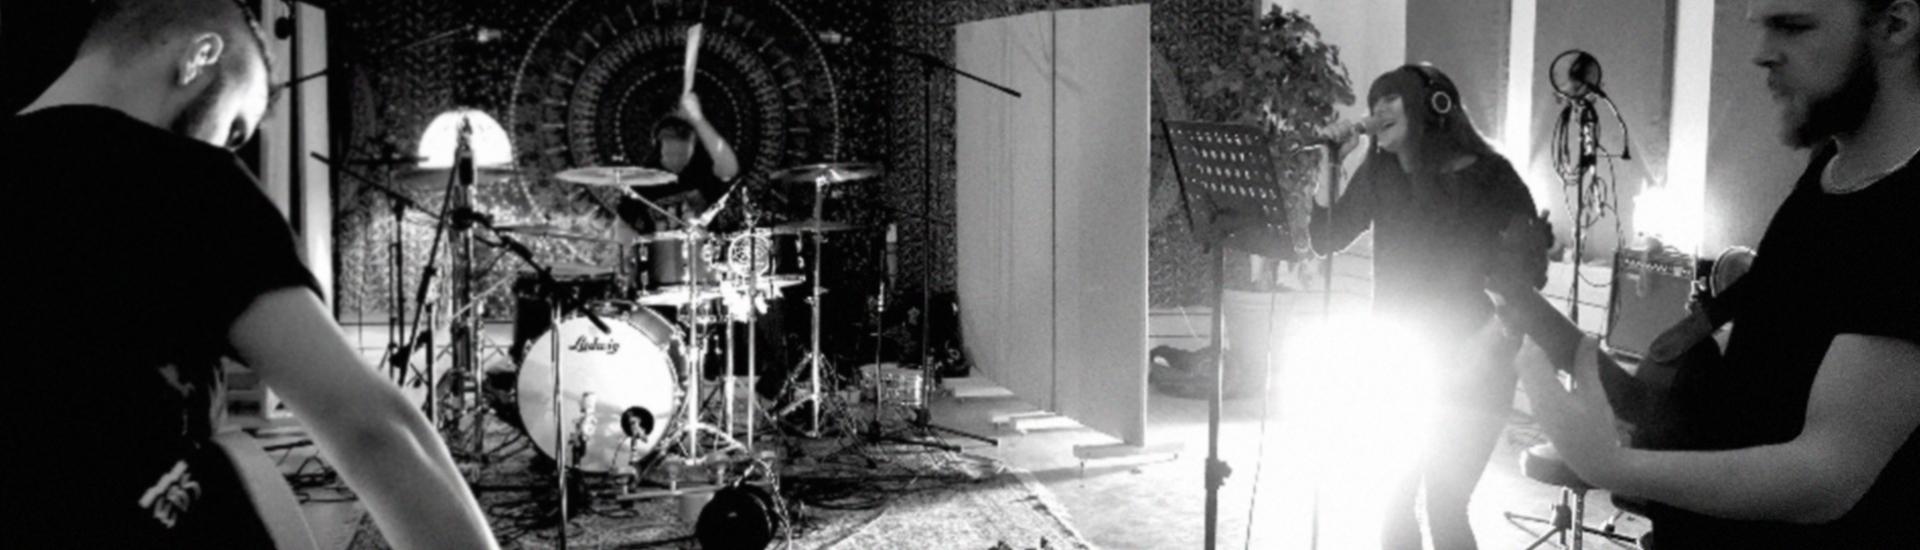 Six Feet Deeper – ösig musik med massa groove!